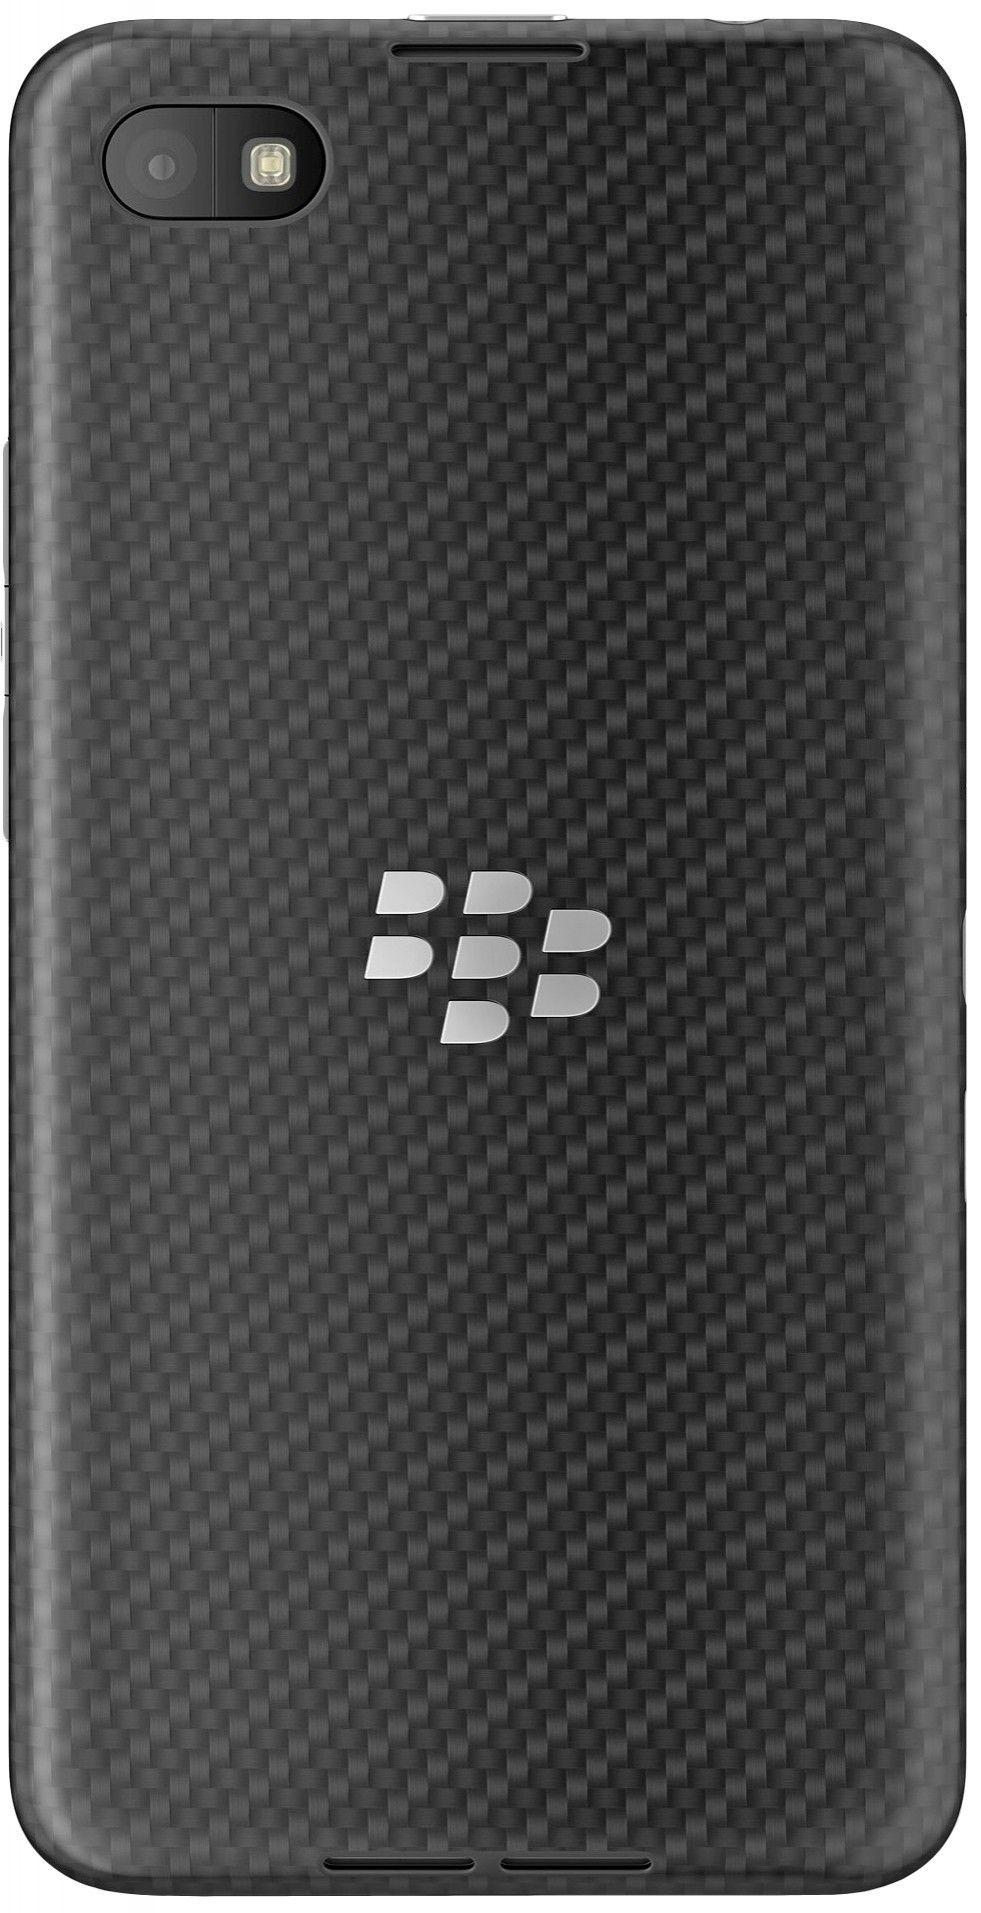 Мобильный телефон BlackBerry Z30 Black - 2